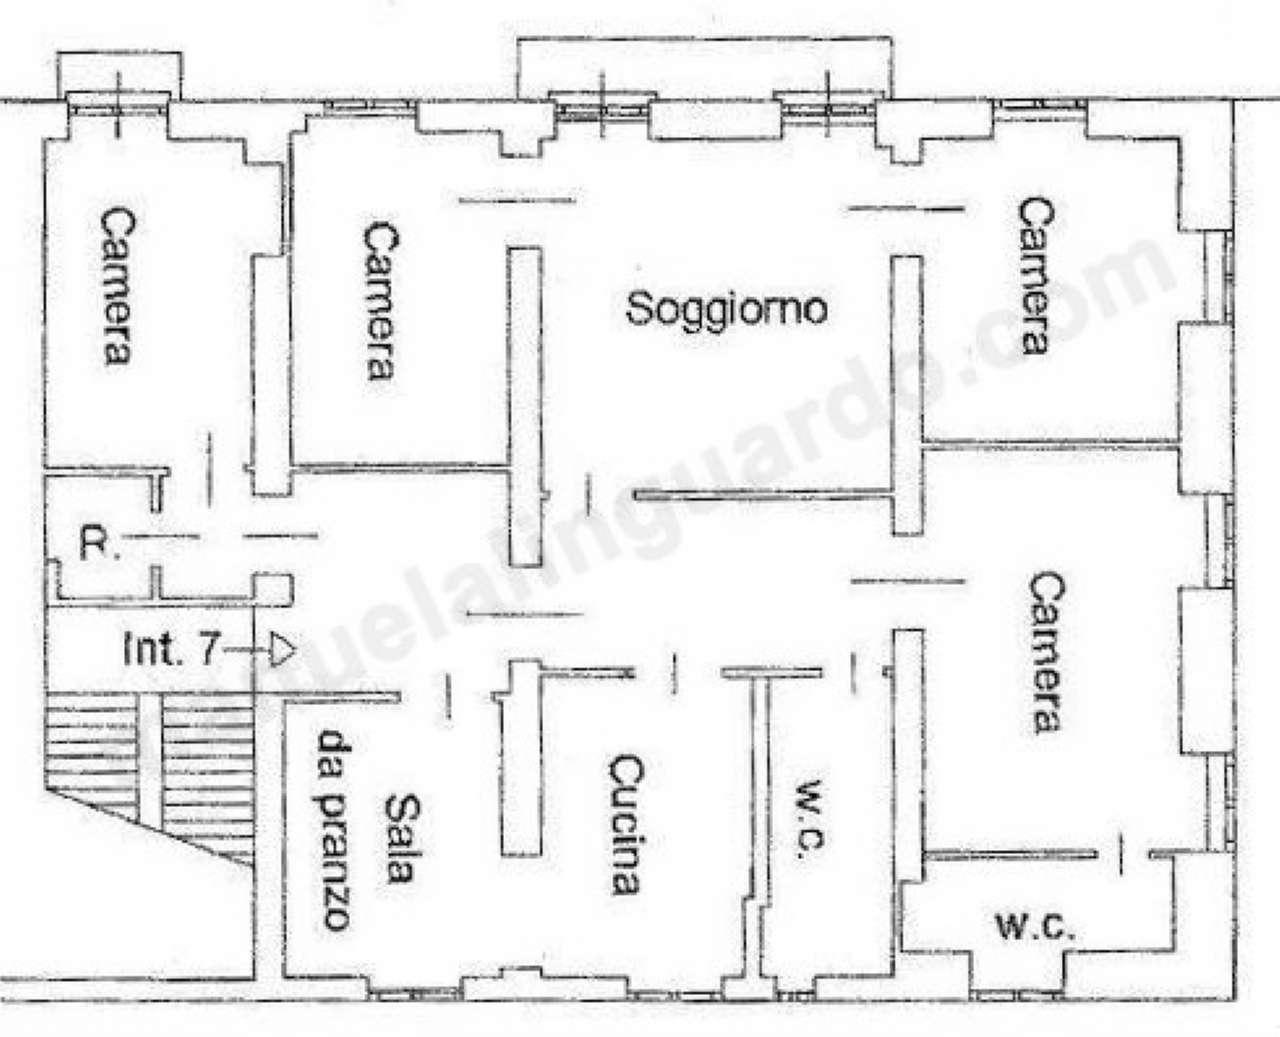 Planimetria appartamentoVia Bozzo 16032